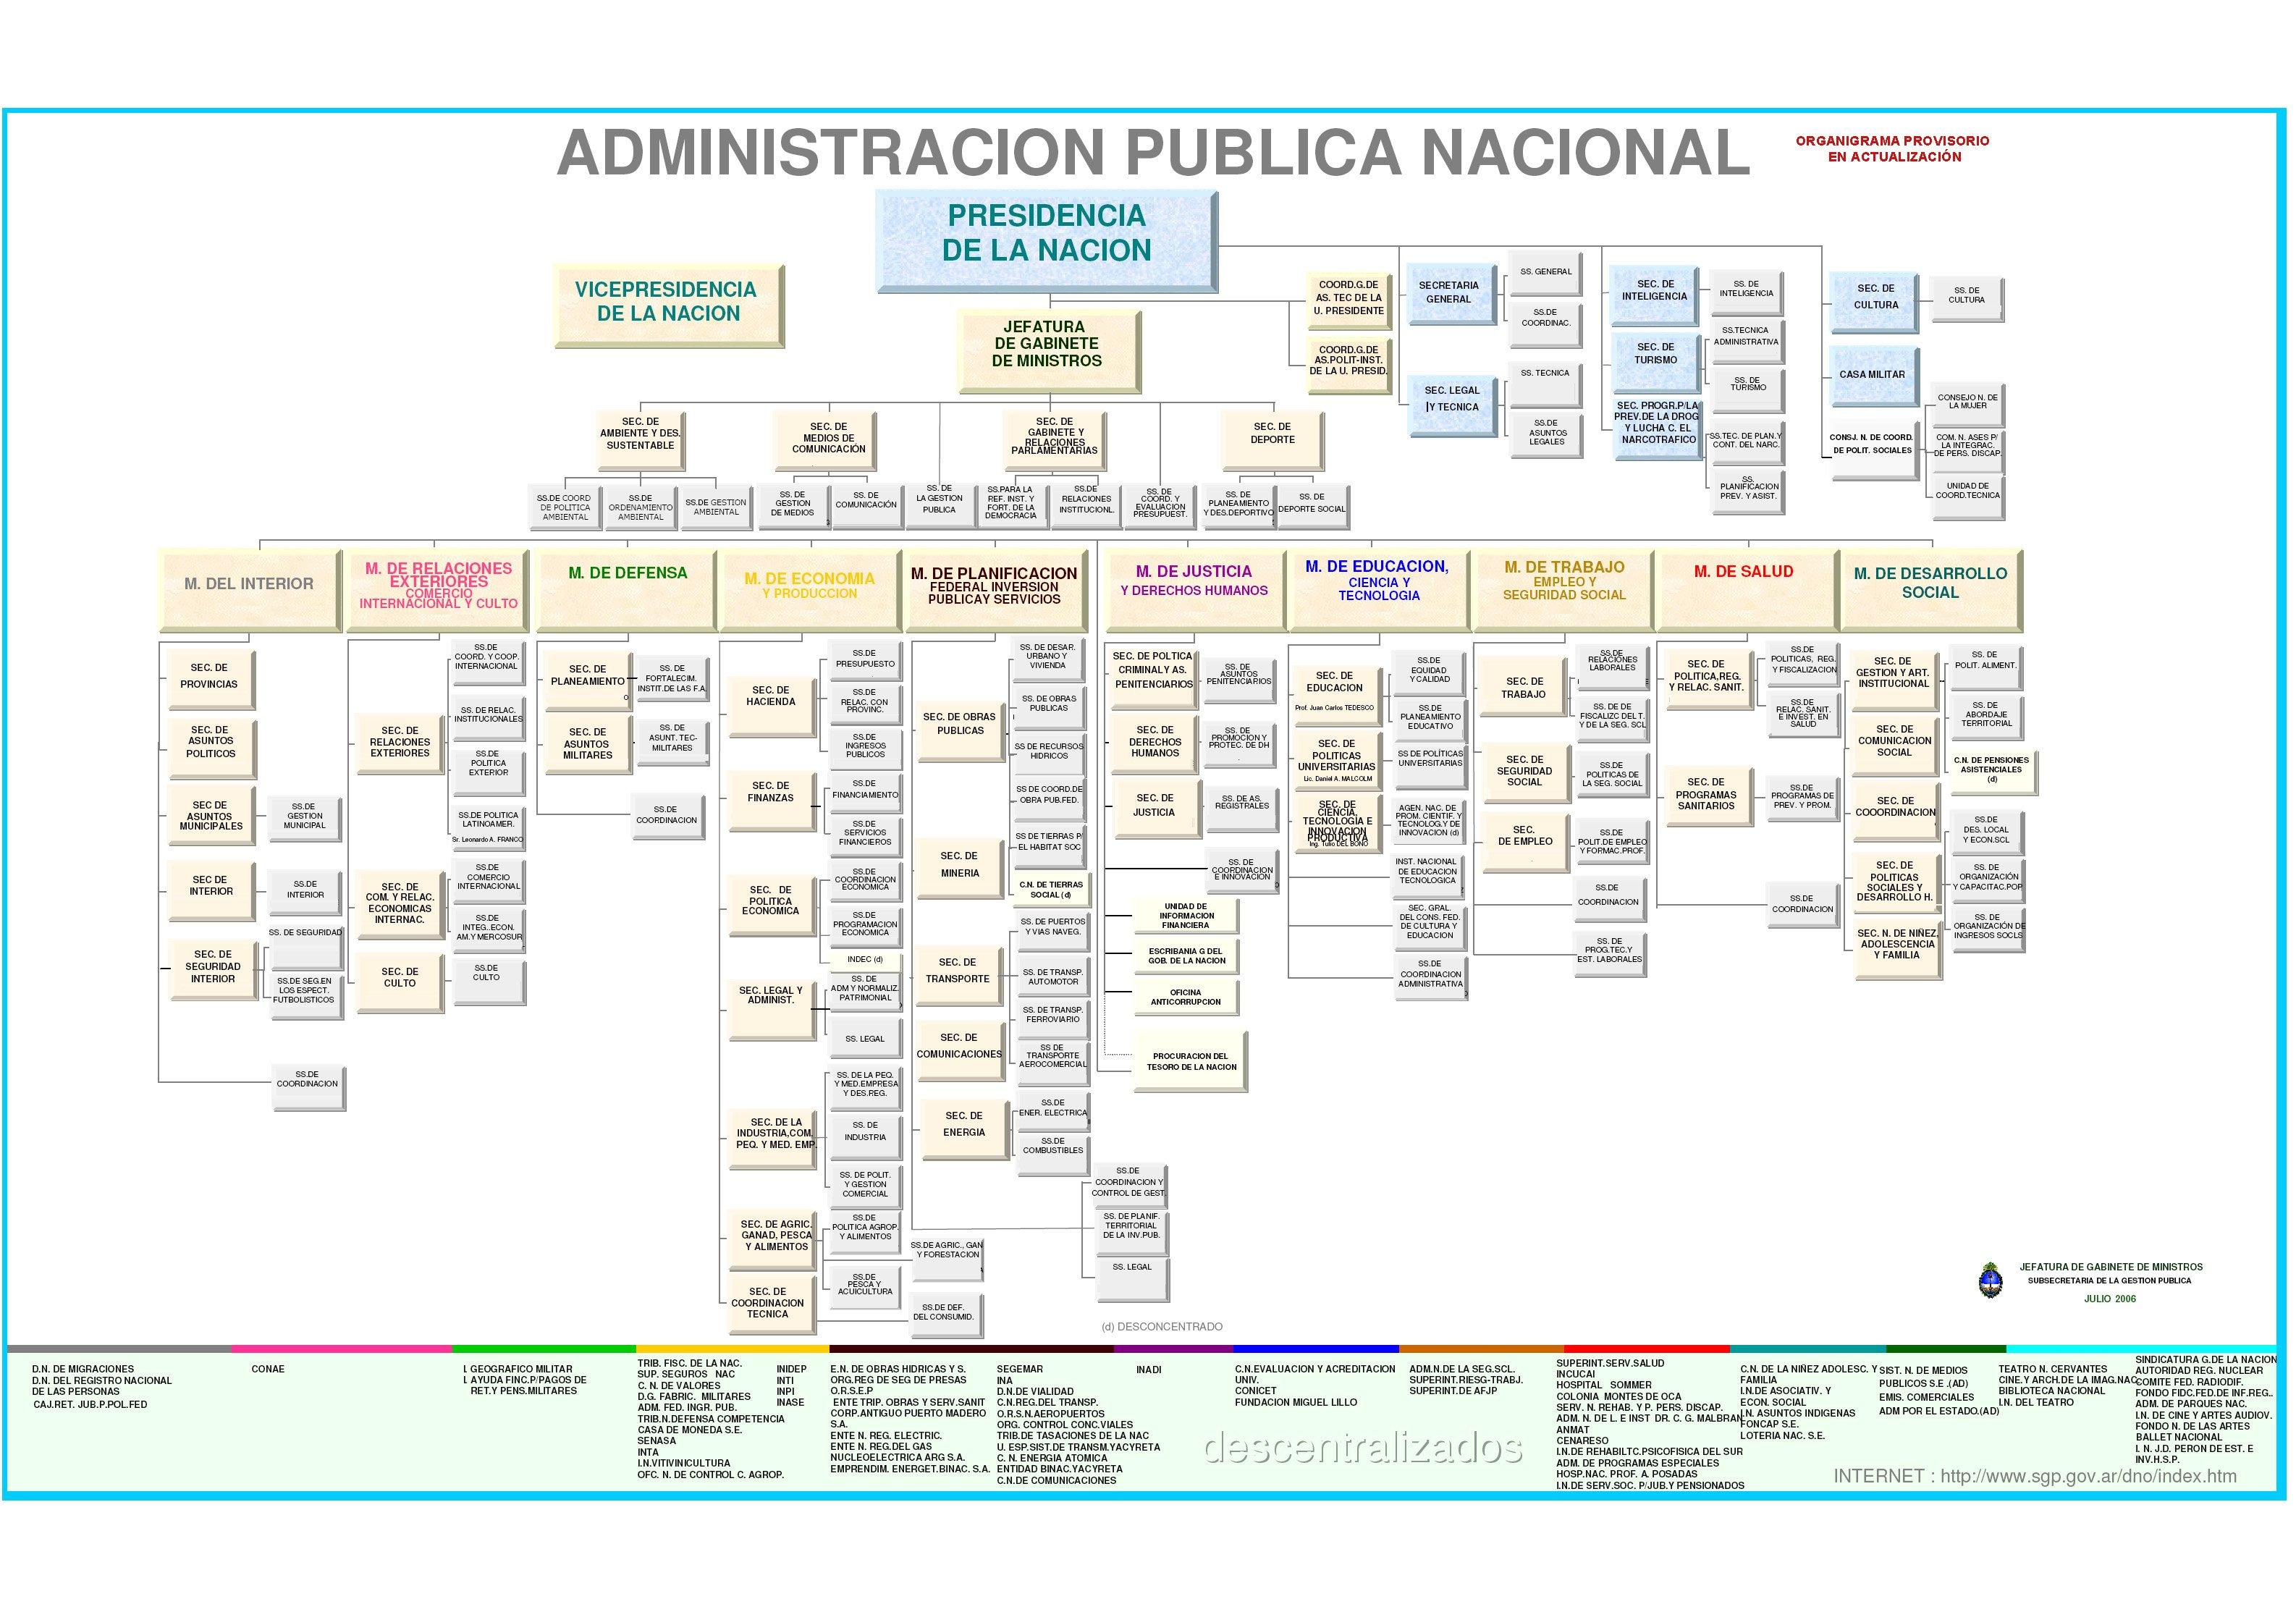 Organizacion Argentina, para saber donde estamos parados